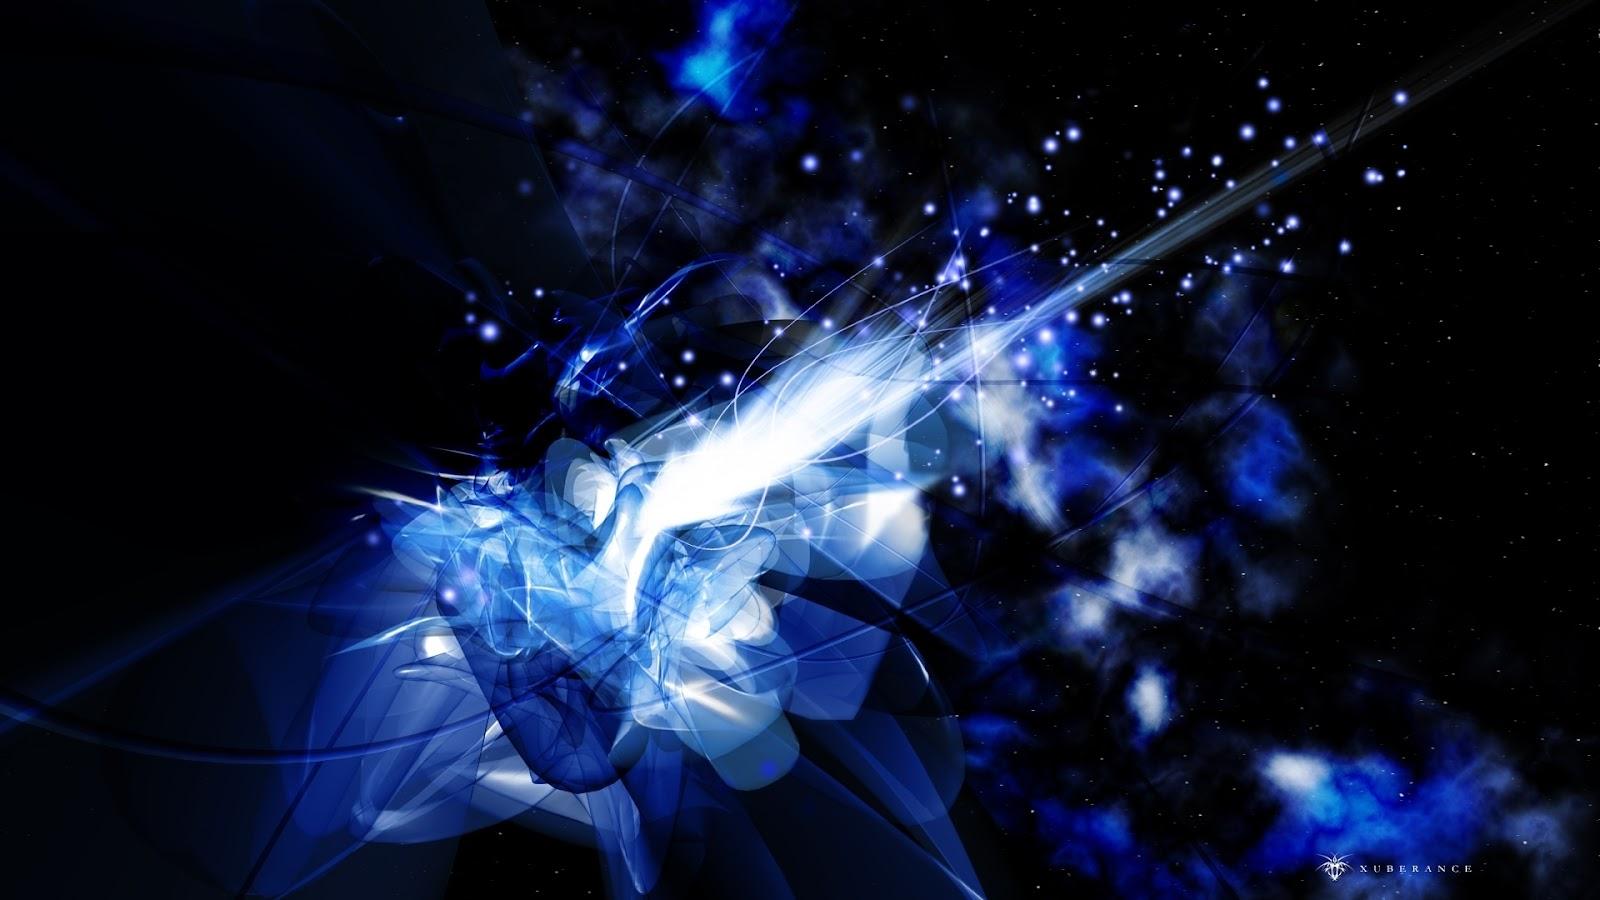 background-light-explosion-image.jpg